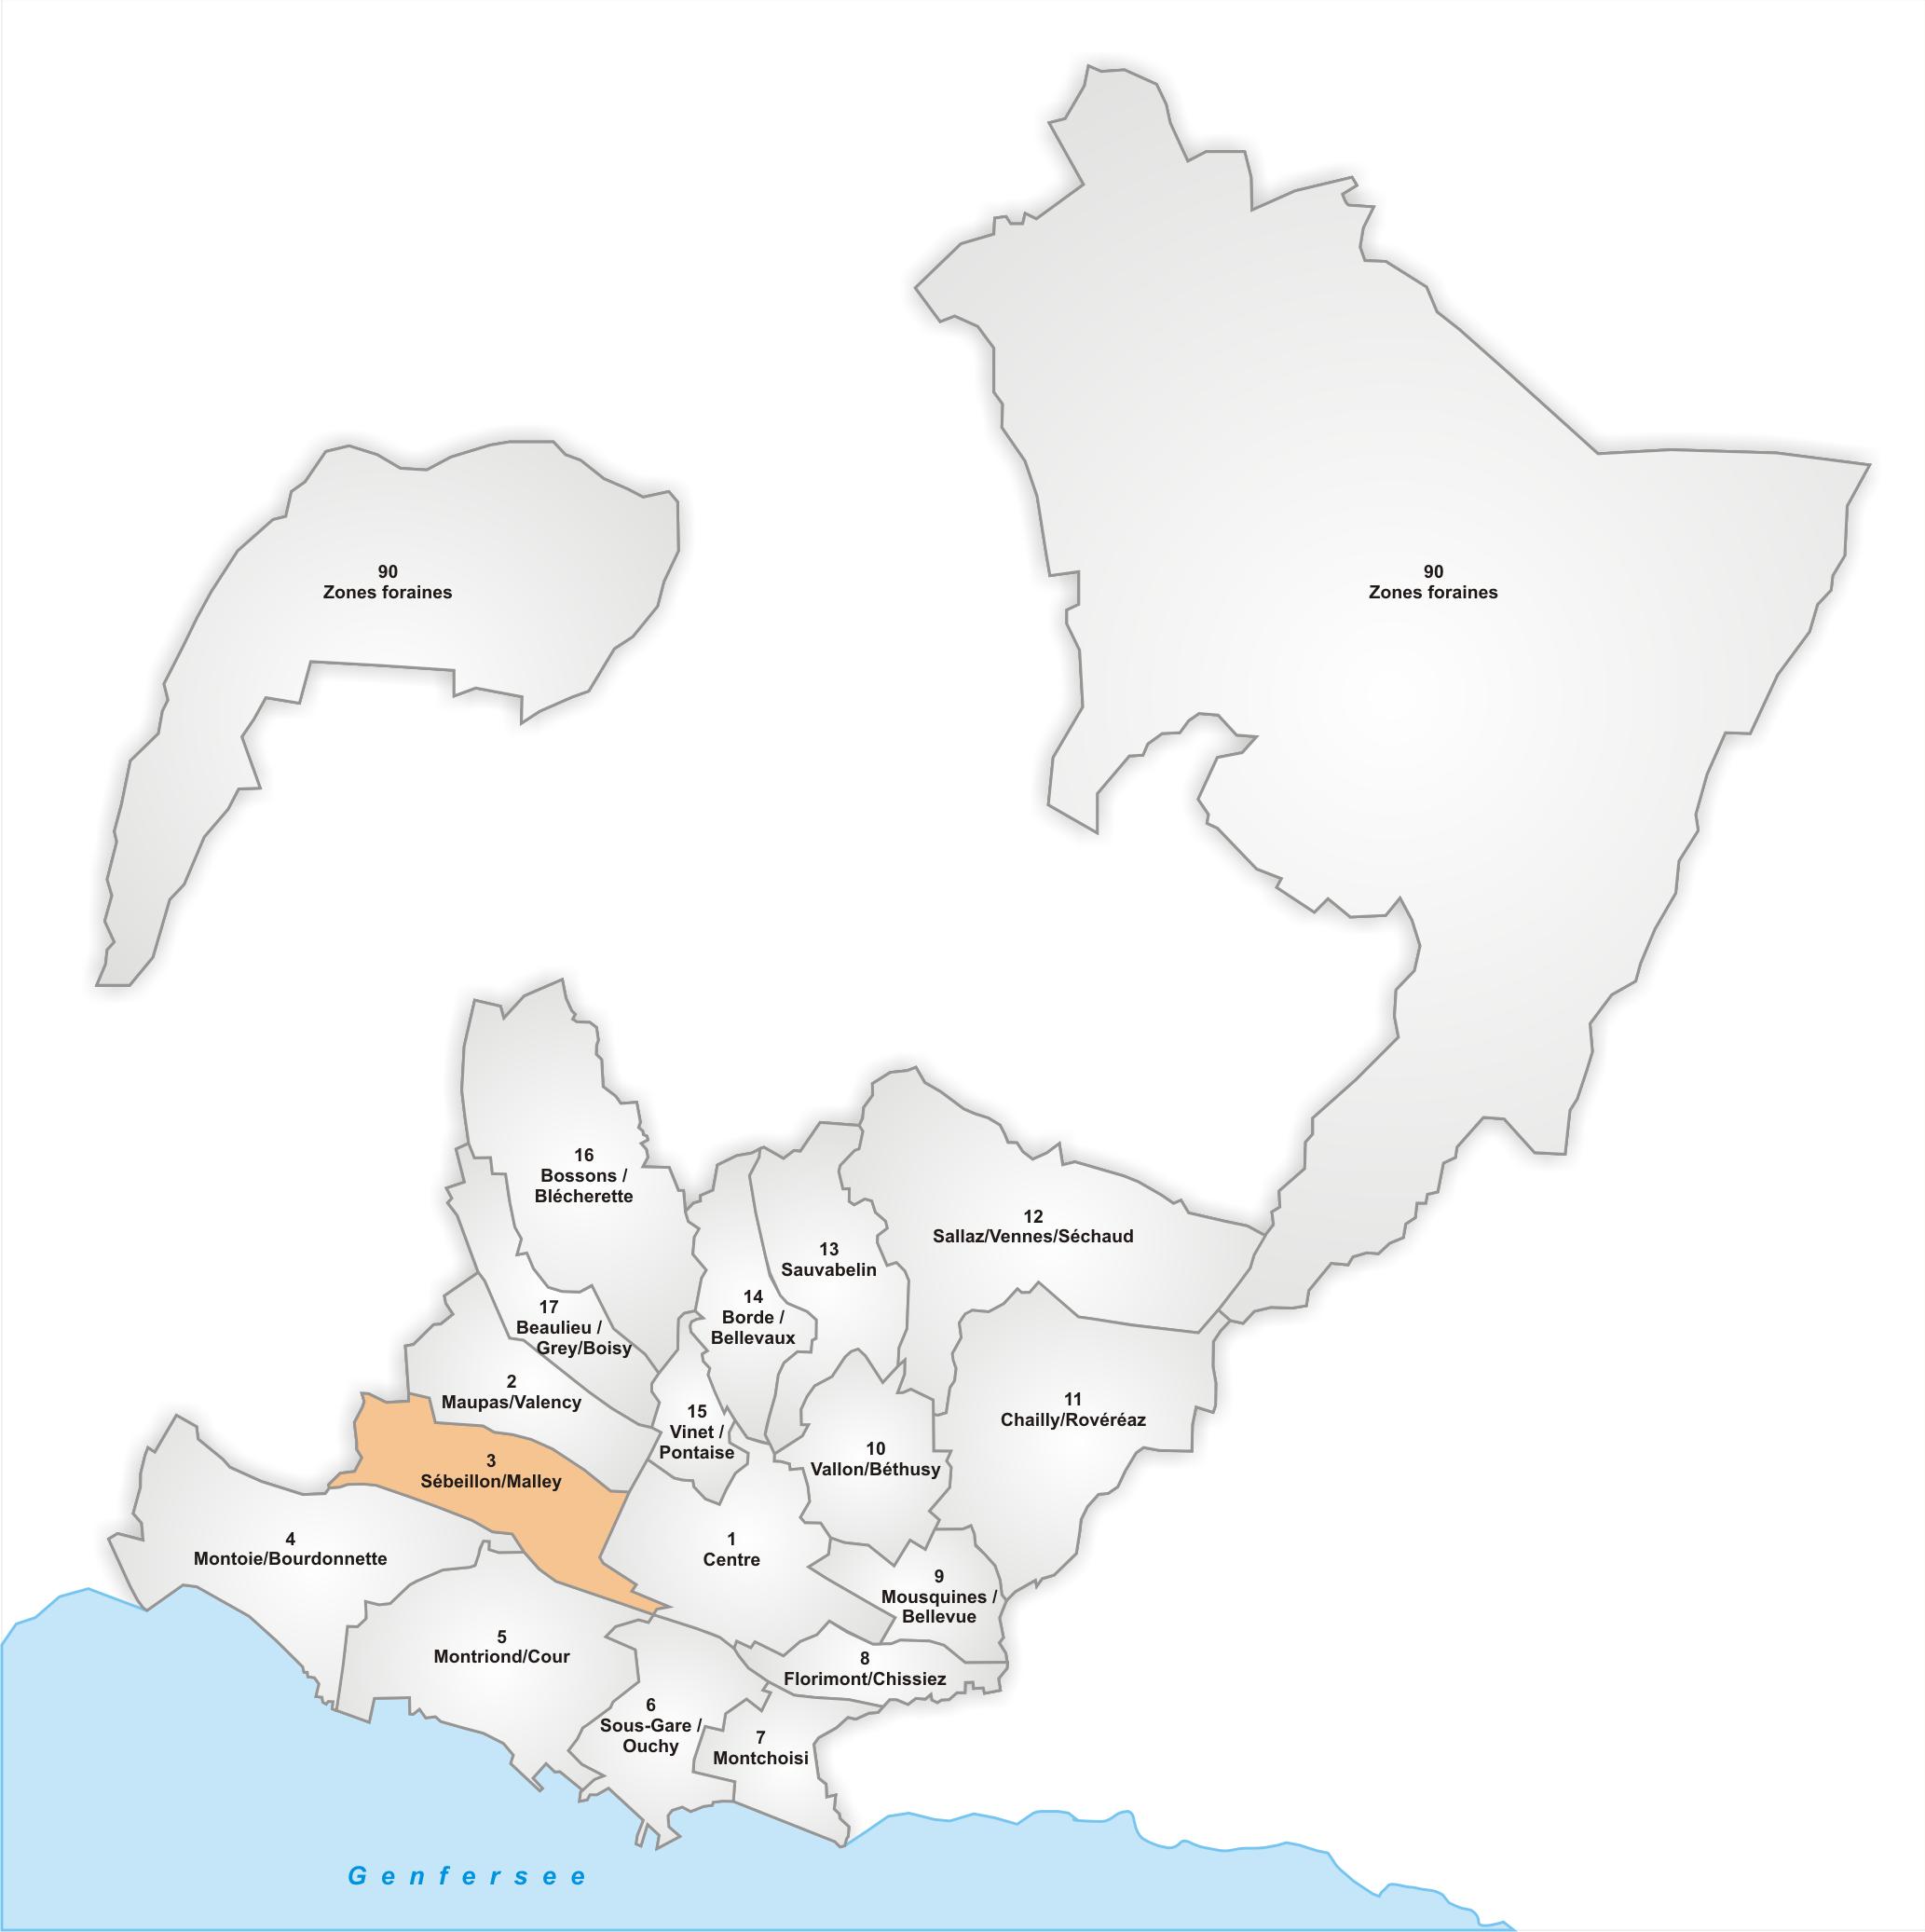 Lage des Stadtteils Sébeillon/Malley